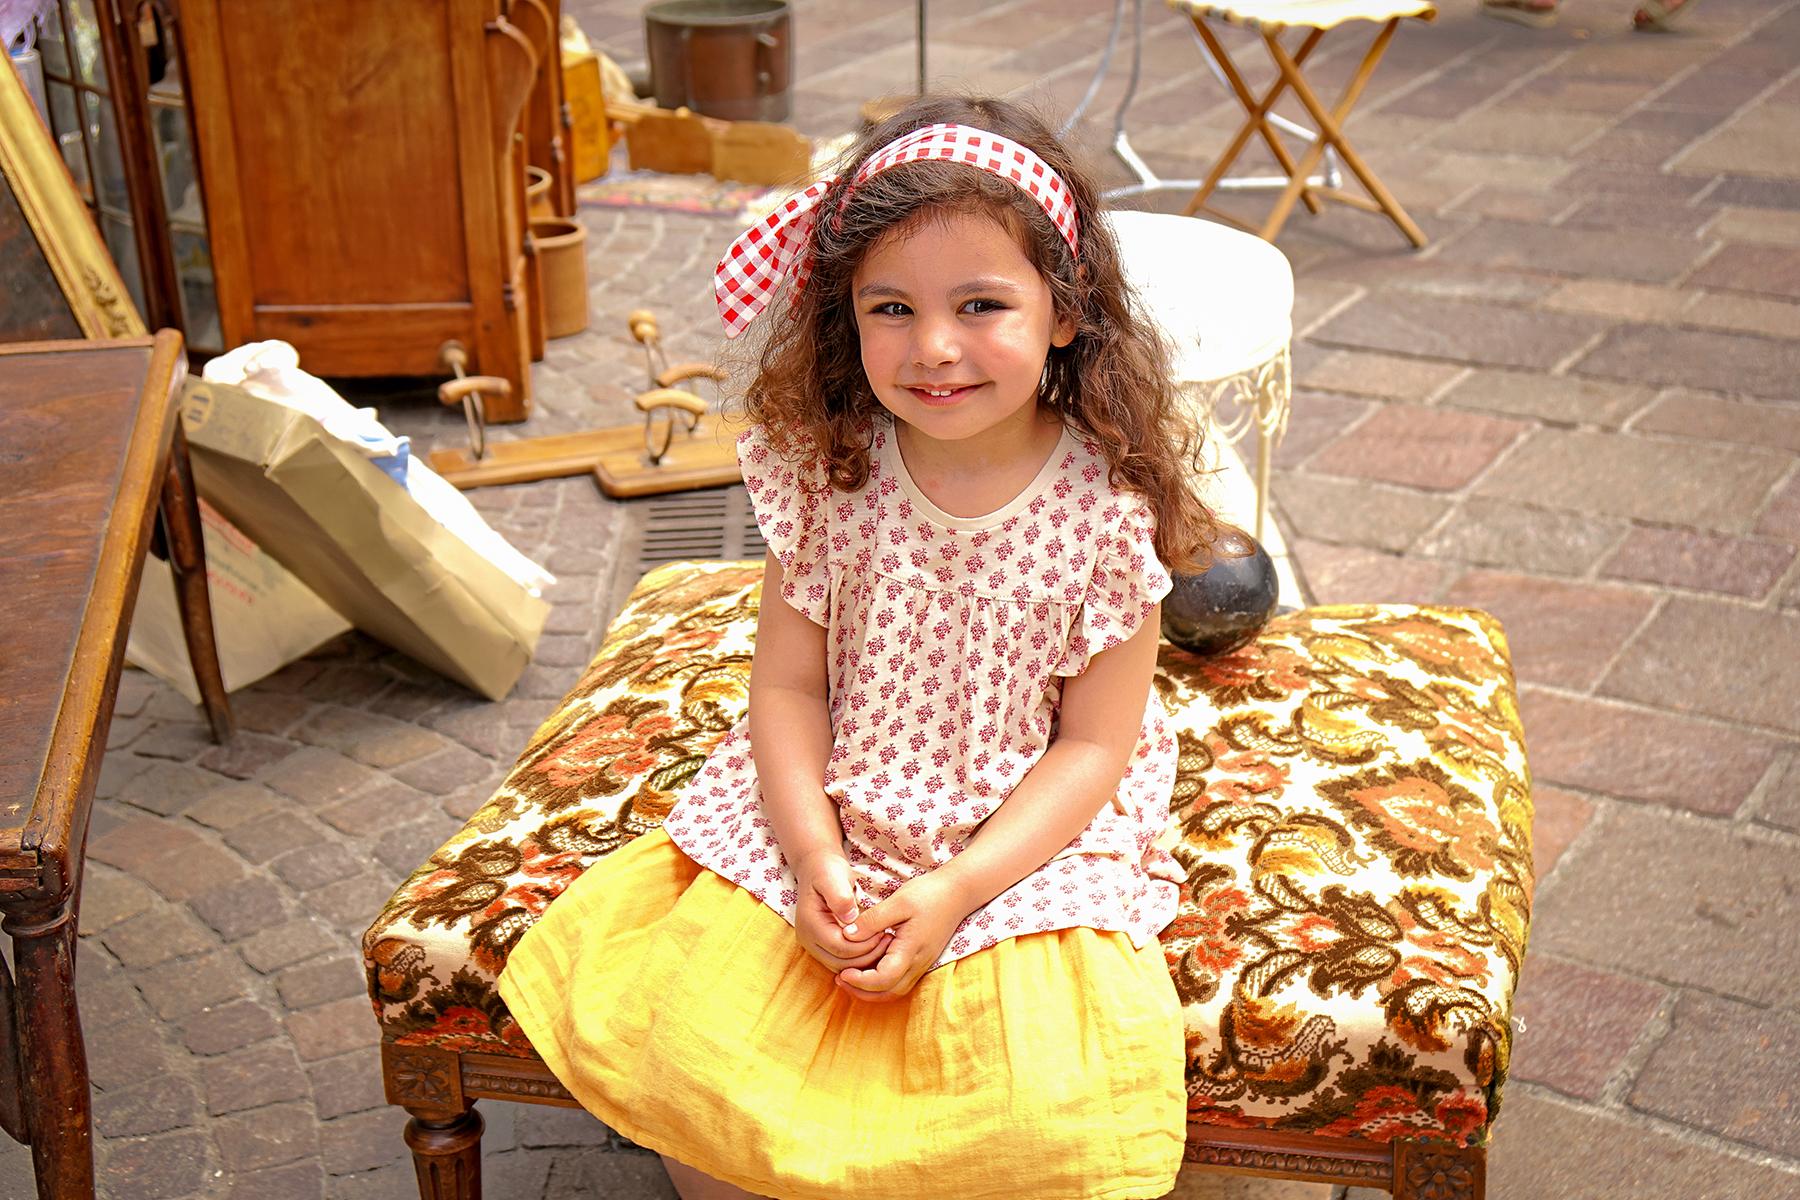 Petite fille à la brocante, Annecy